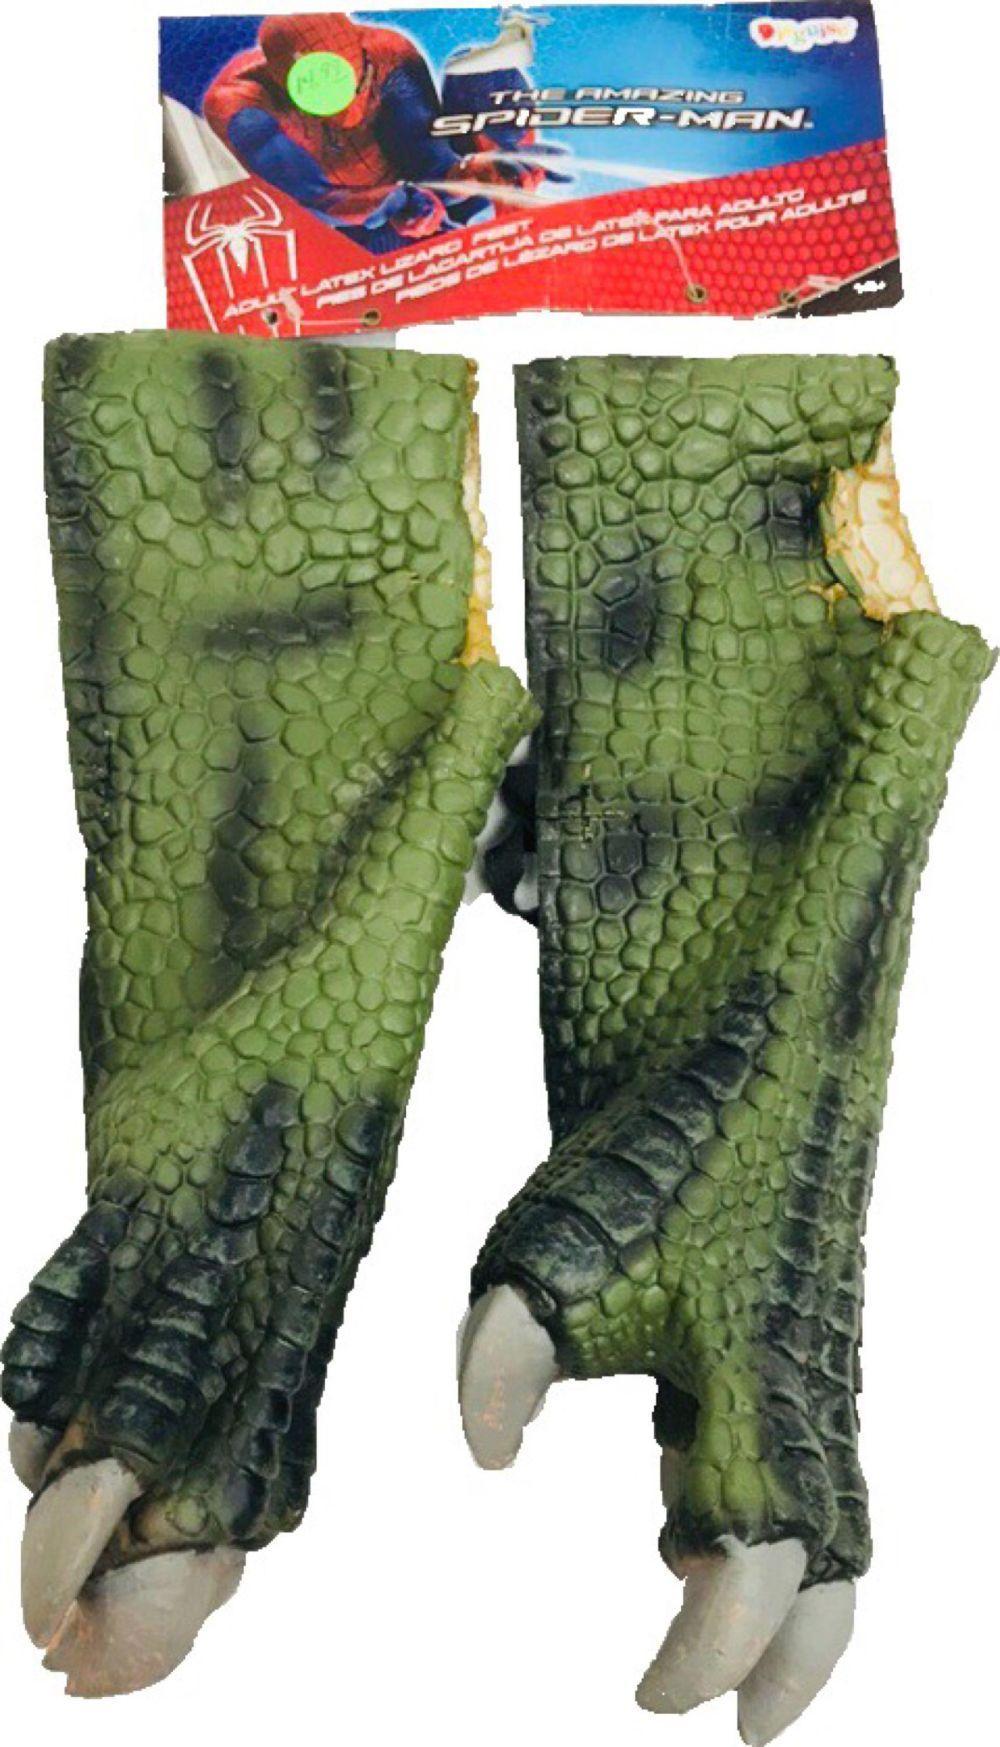 NOS - Spider - Man - Adult Latex Lizard Feet - Halloween Costume Accessory